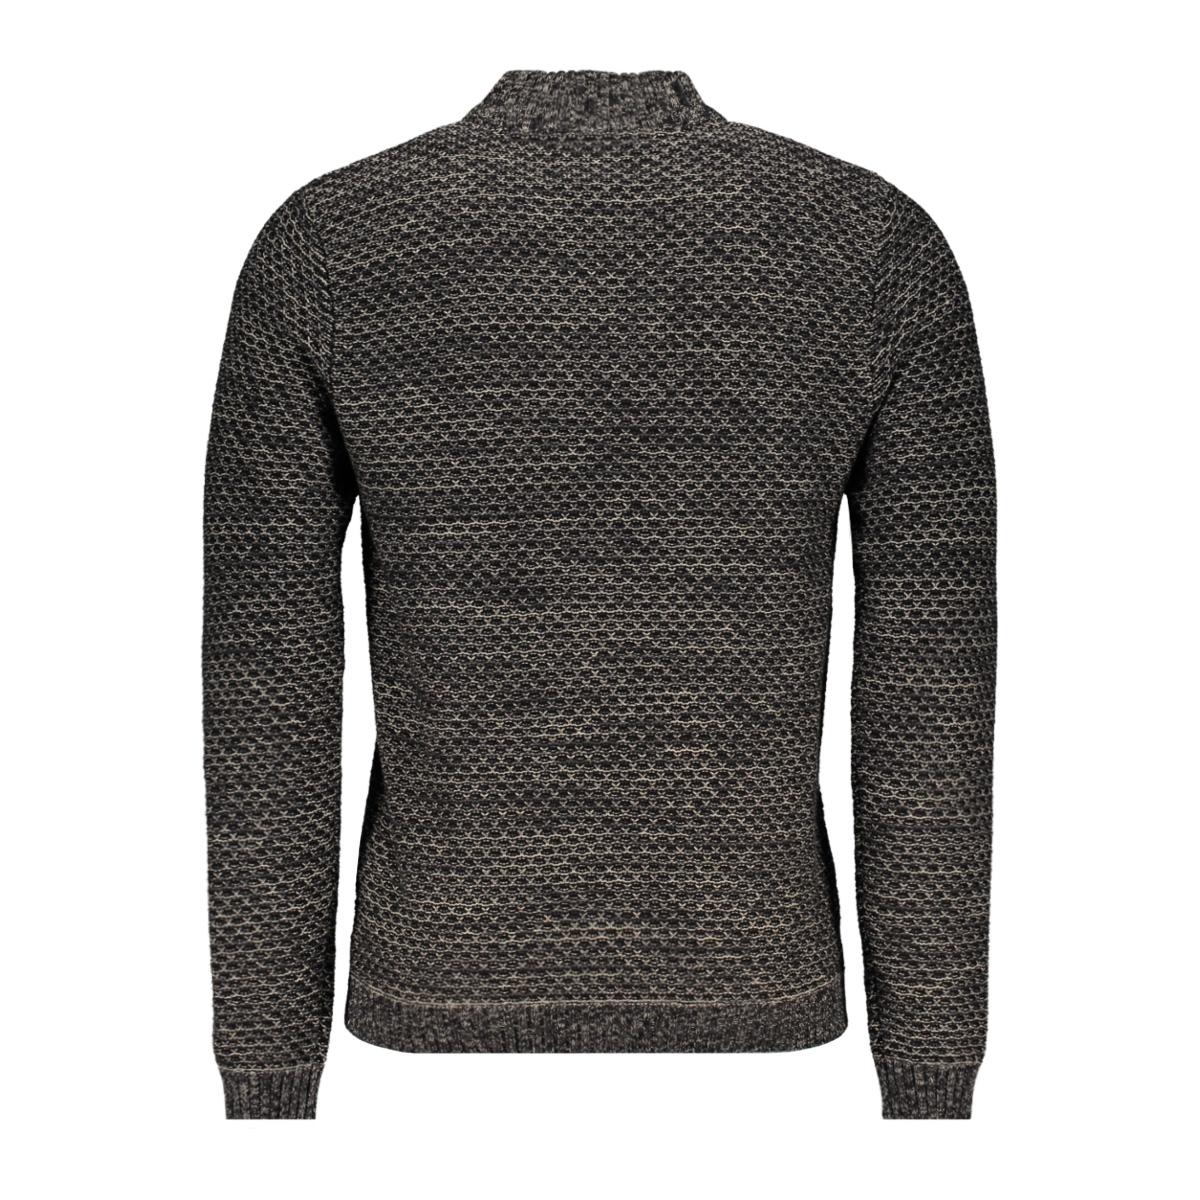 87231033 no-excess trui 023 dk grey